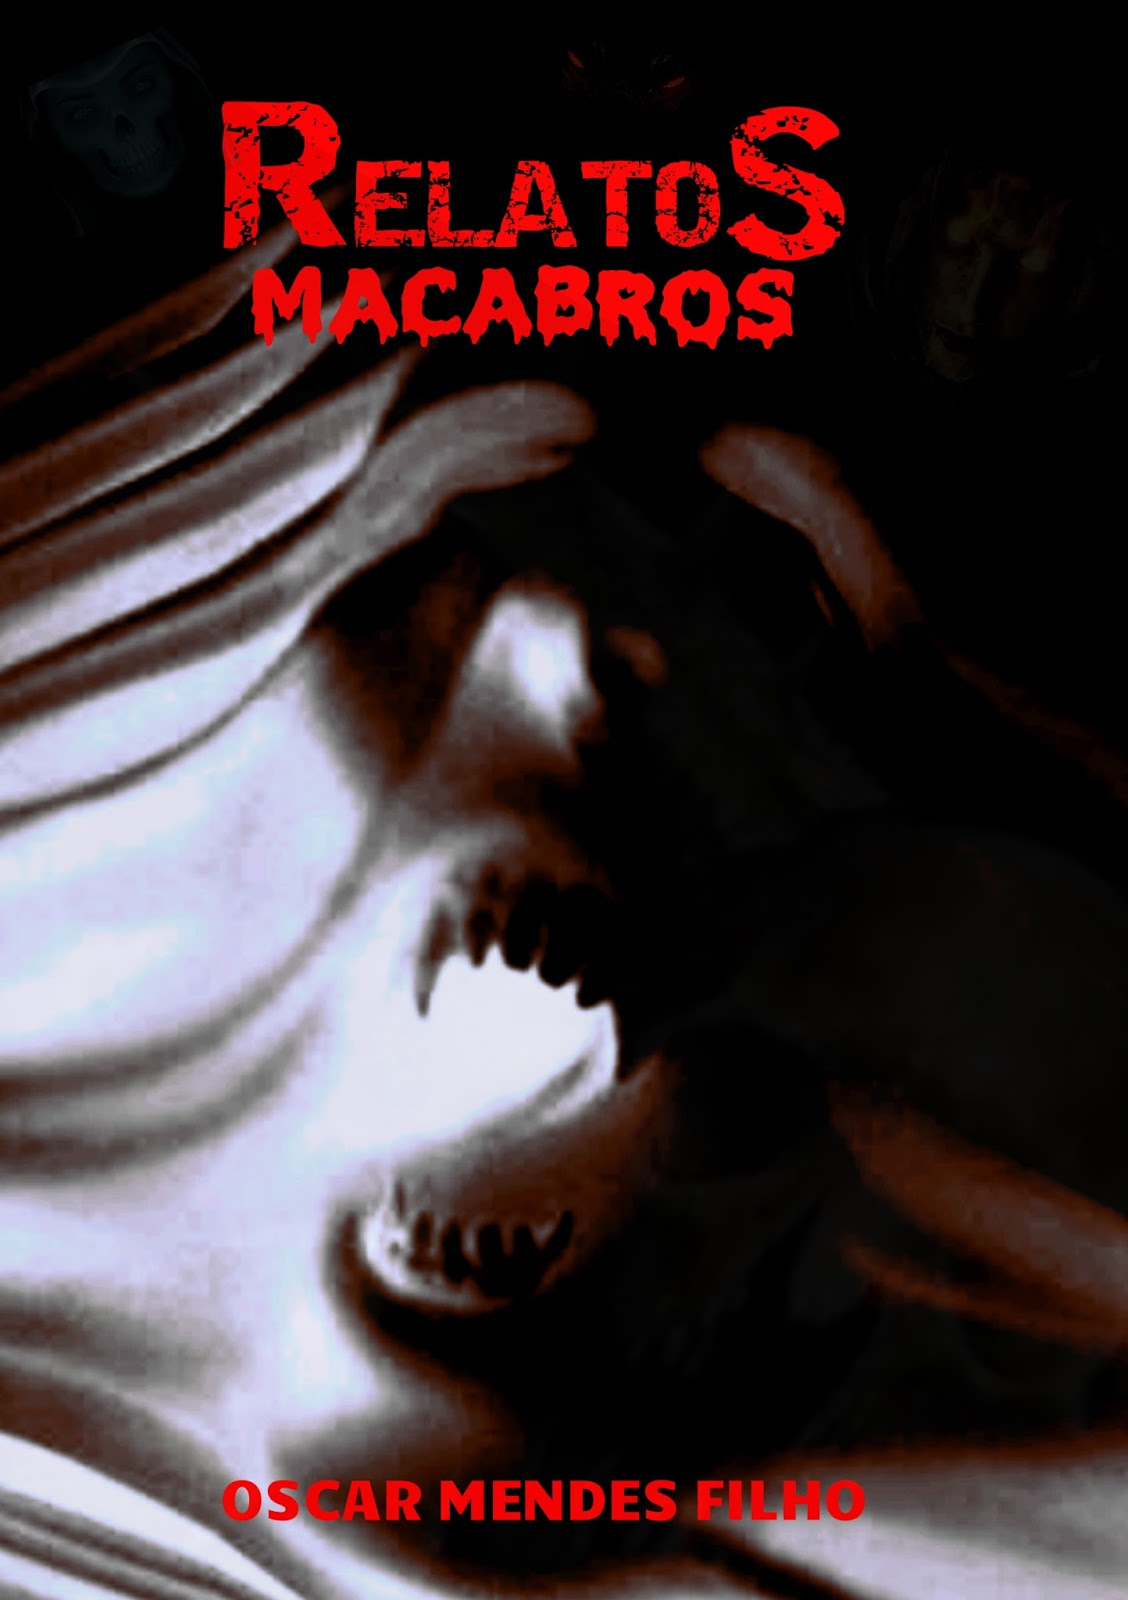 Relatos Macabros